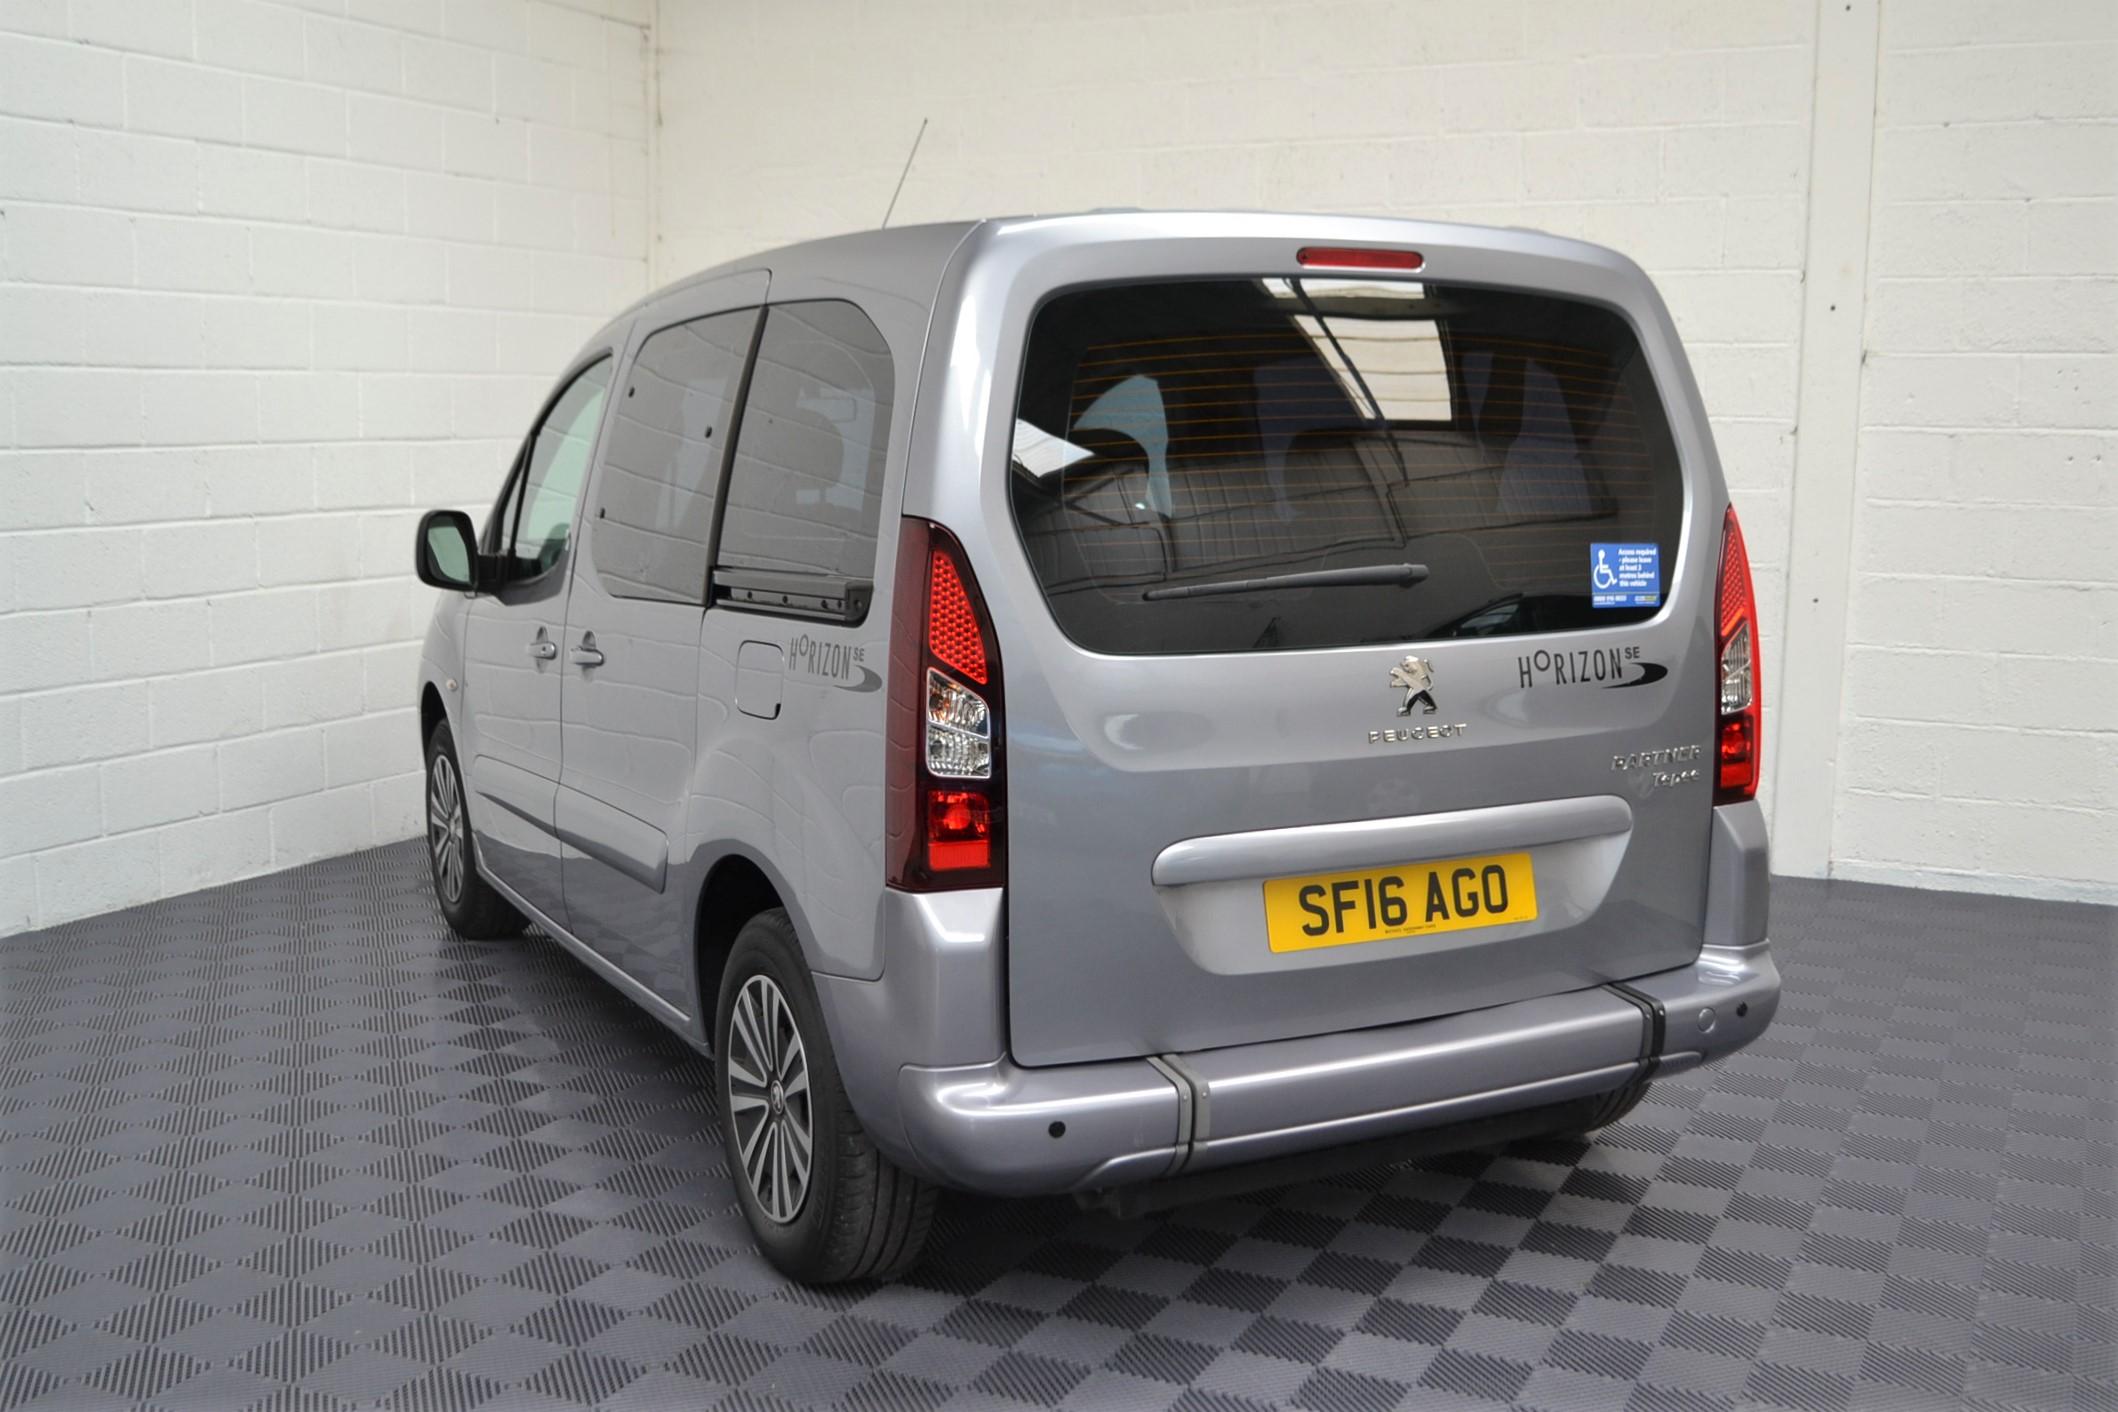 Used Wav Cars for Sale UK Citroen Berlingo WAV Car Peugeot Partner Petrol Wheelchair Accessible Vehicles Buy Sell Bristol Somerset Devon Dorset 3